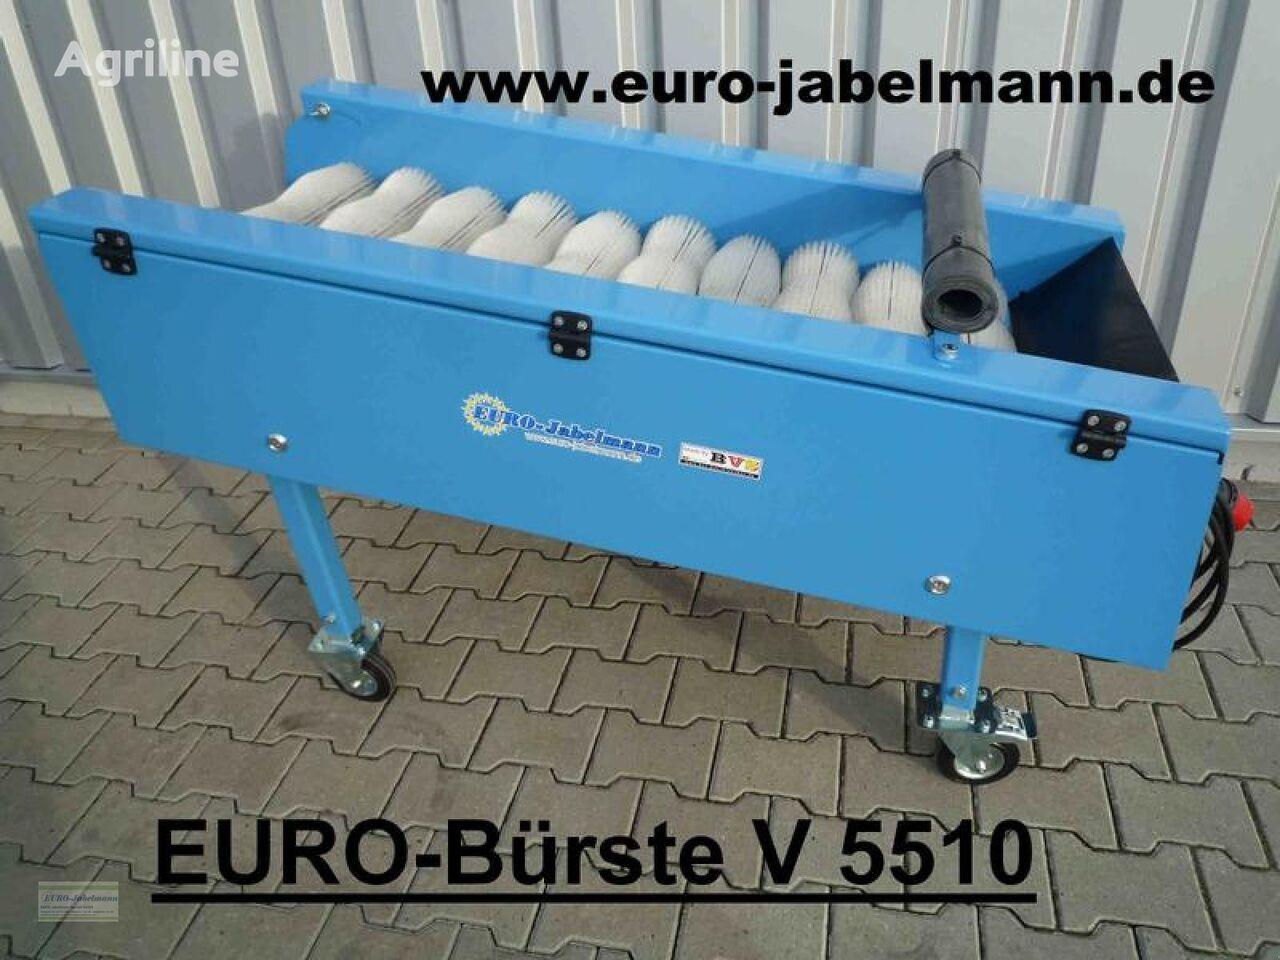 nový myčka zeleniny EURO-Jabelmann 550 - 2200 mm breit, eigene Herstellung (Made in Germany)